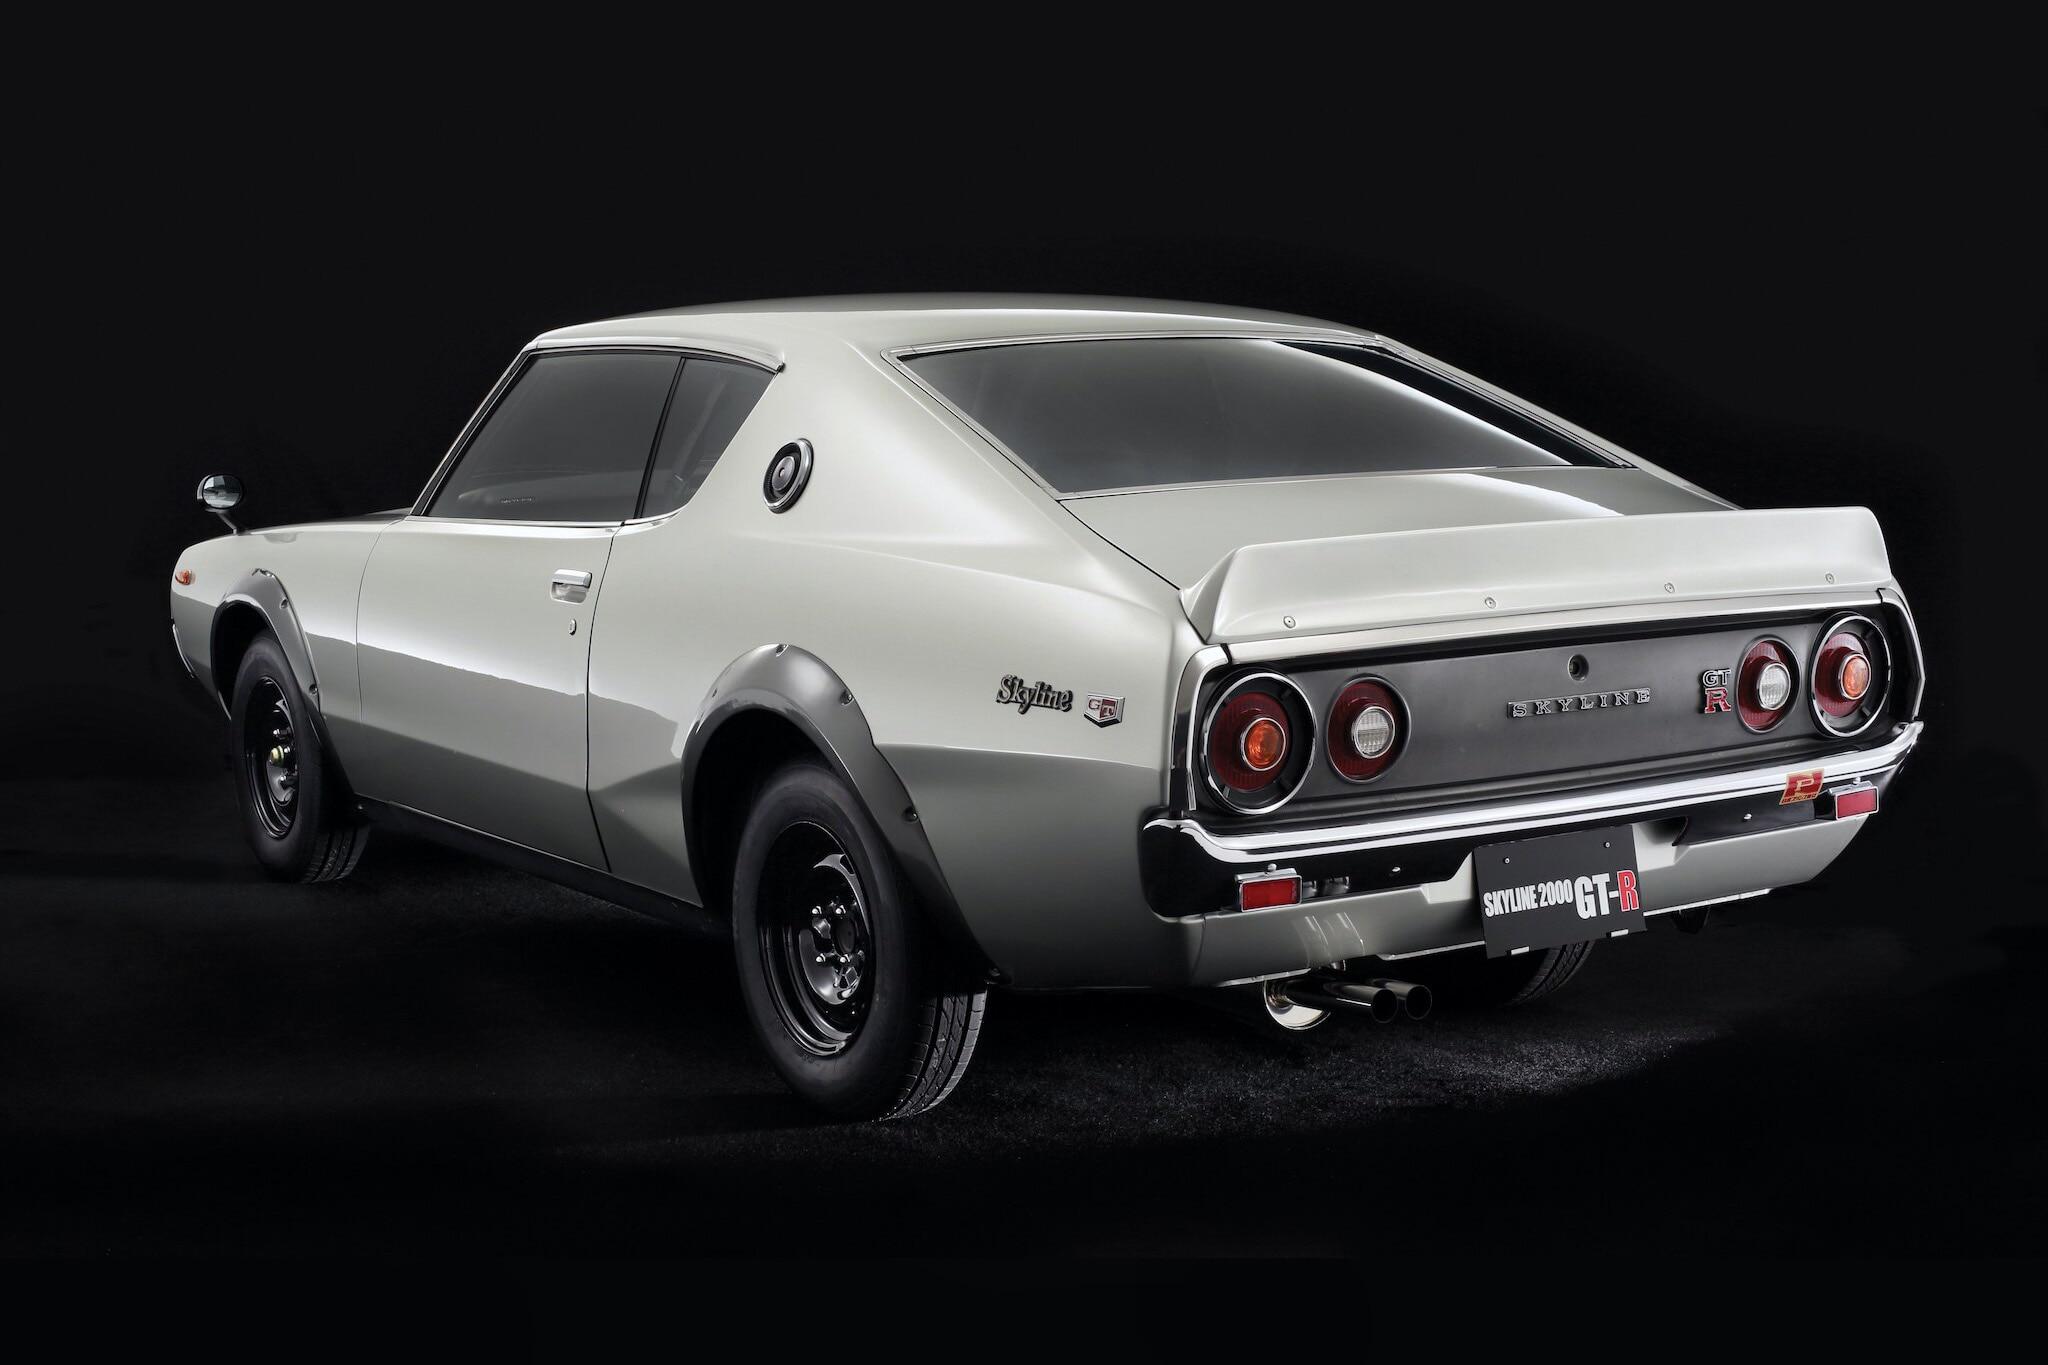 Rare Kenmeri 1973 Skyline Gt R At Auction